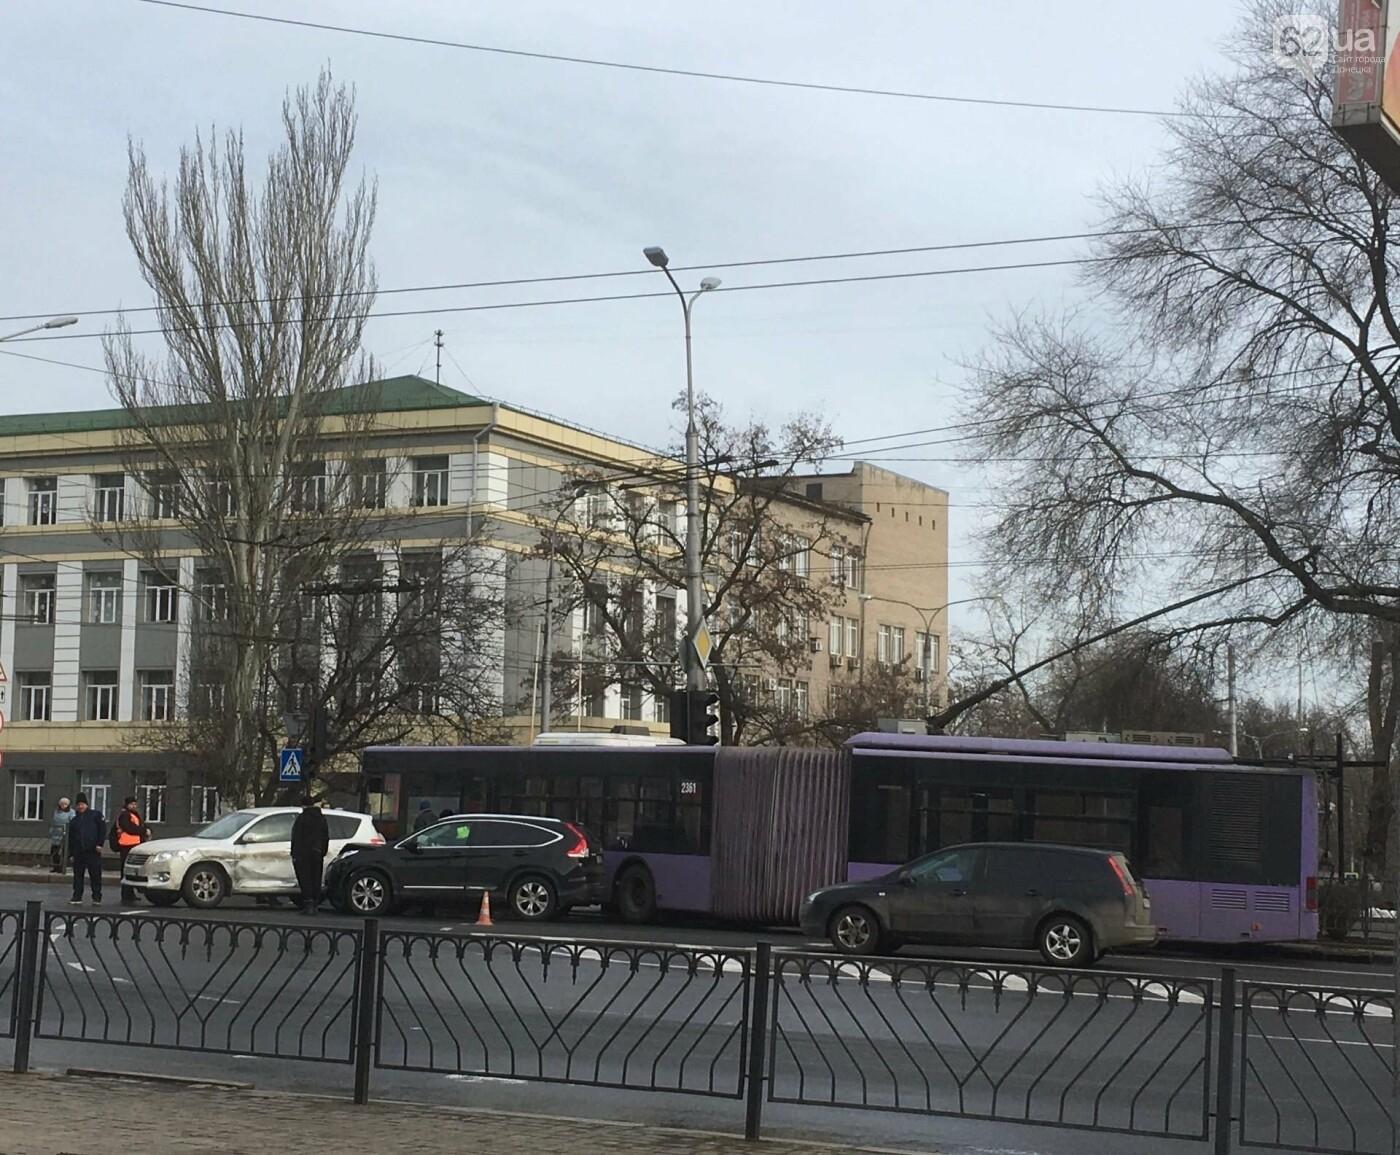 Тройное ДТП в центре Донецка: столкнулись троллейбус и два джипа, - ФОТО, фото-1